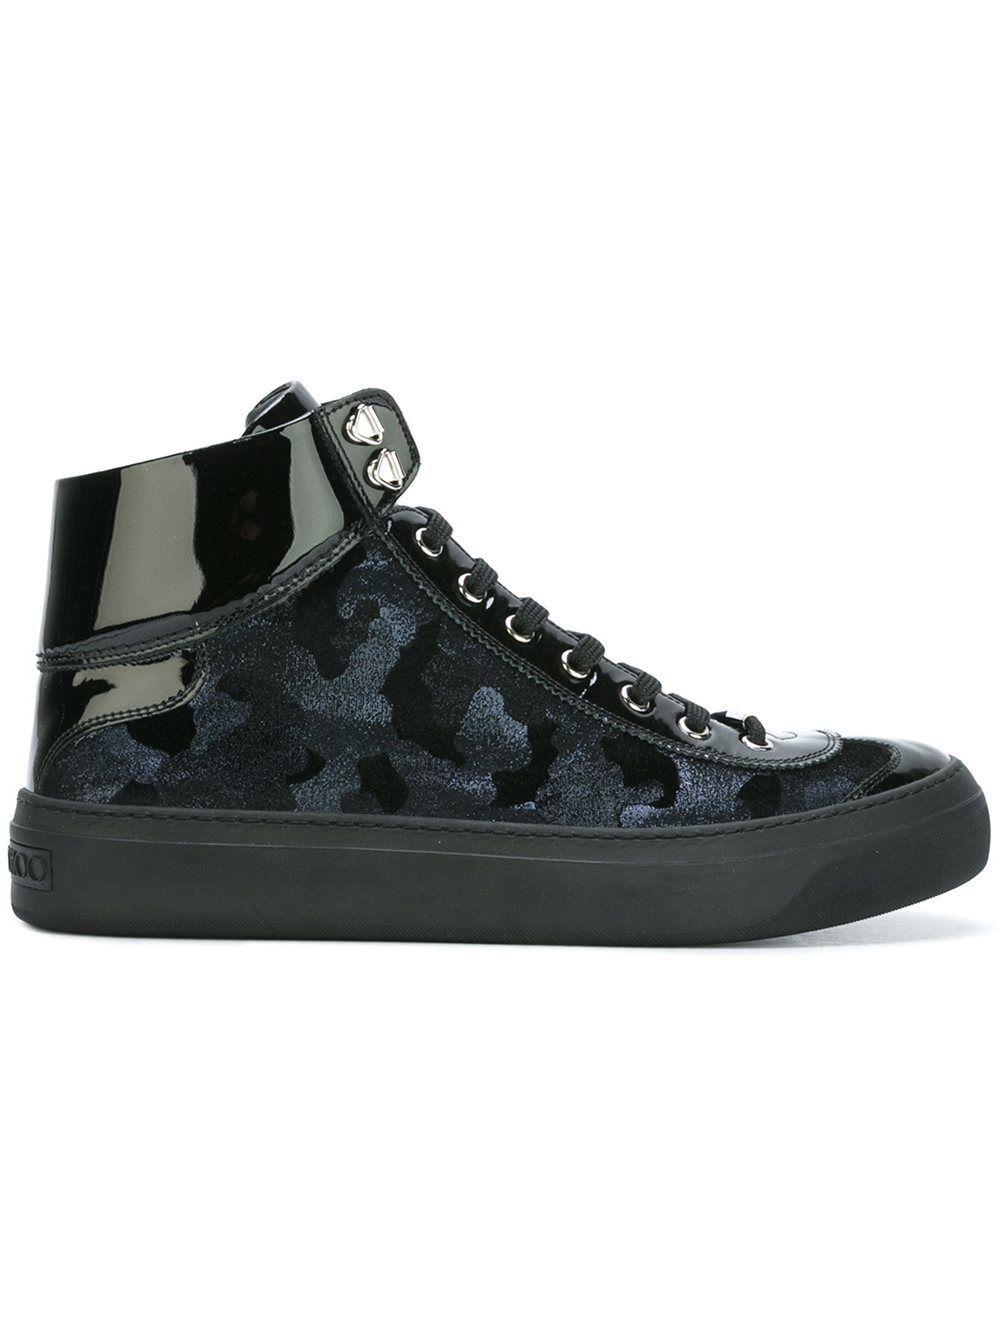 6b286e4d558e Jimmy Choo  Argyle  hi-top sneakers